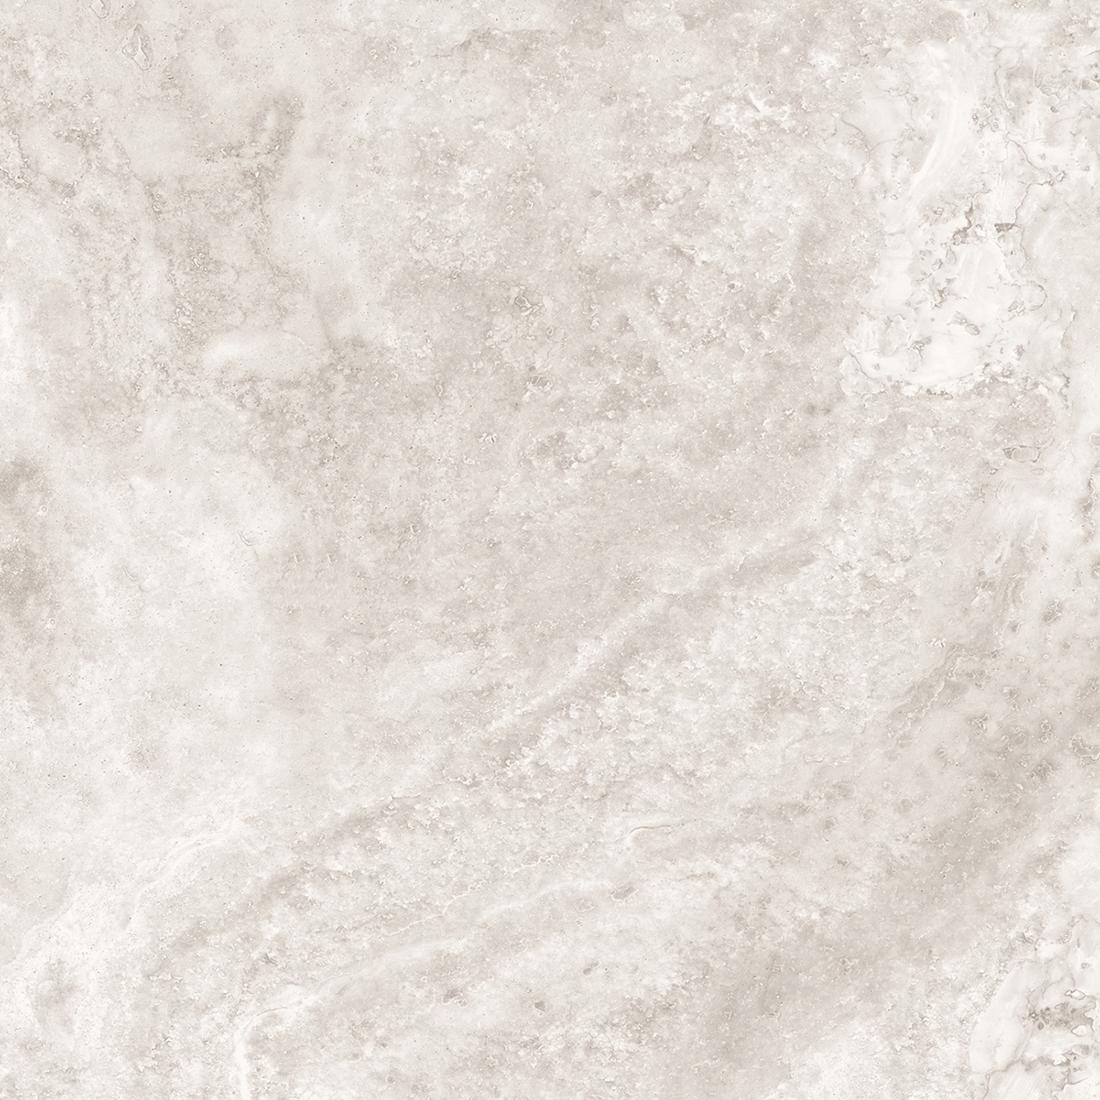 Alabastrino 60x60 Grey Gloss 1